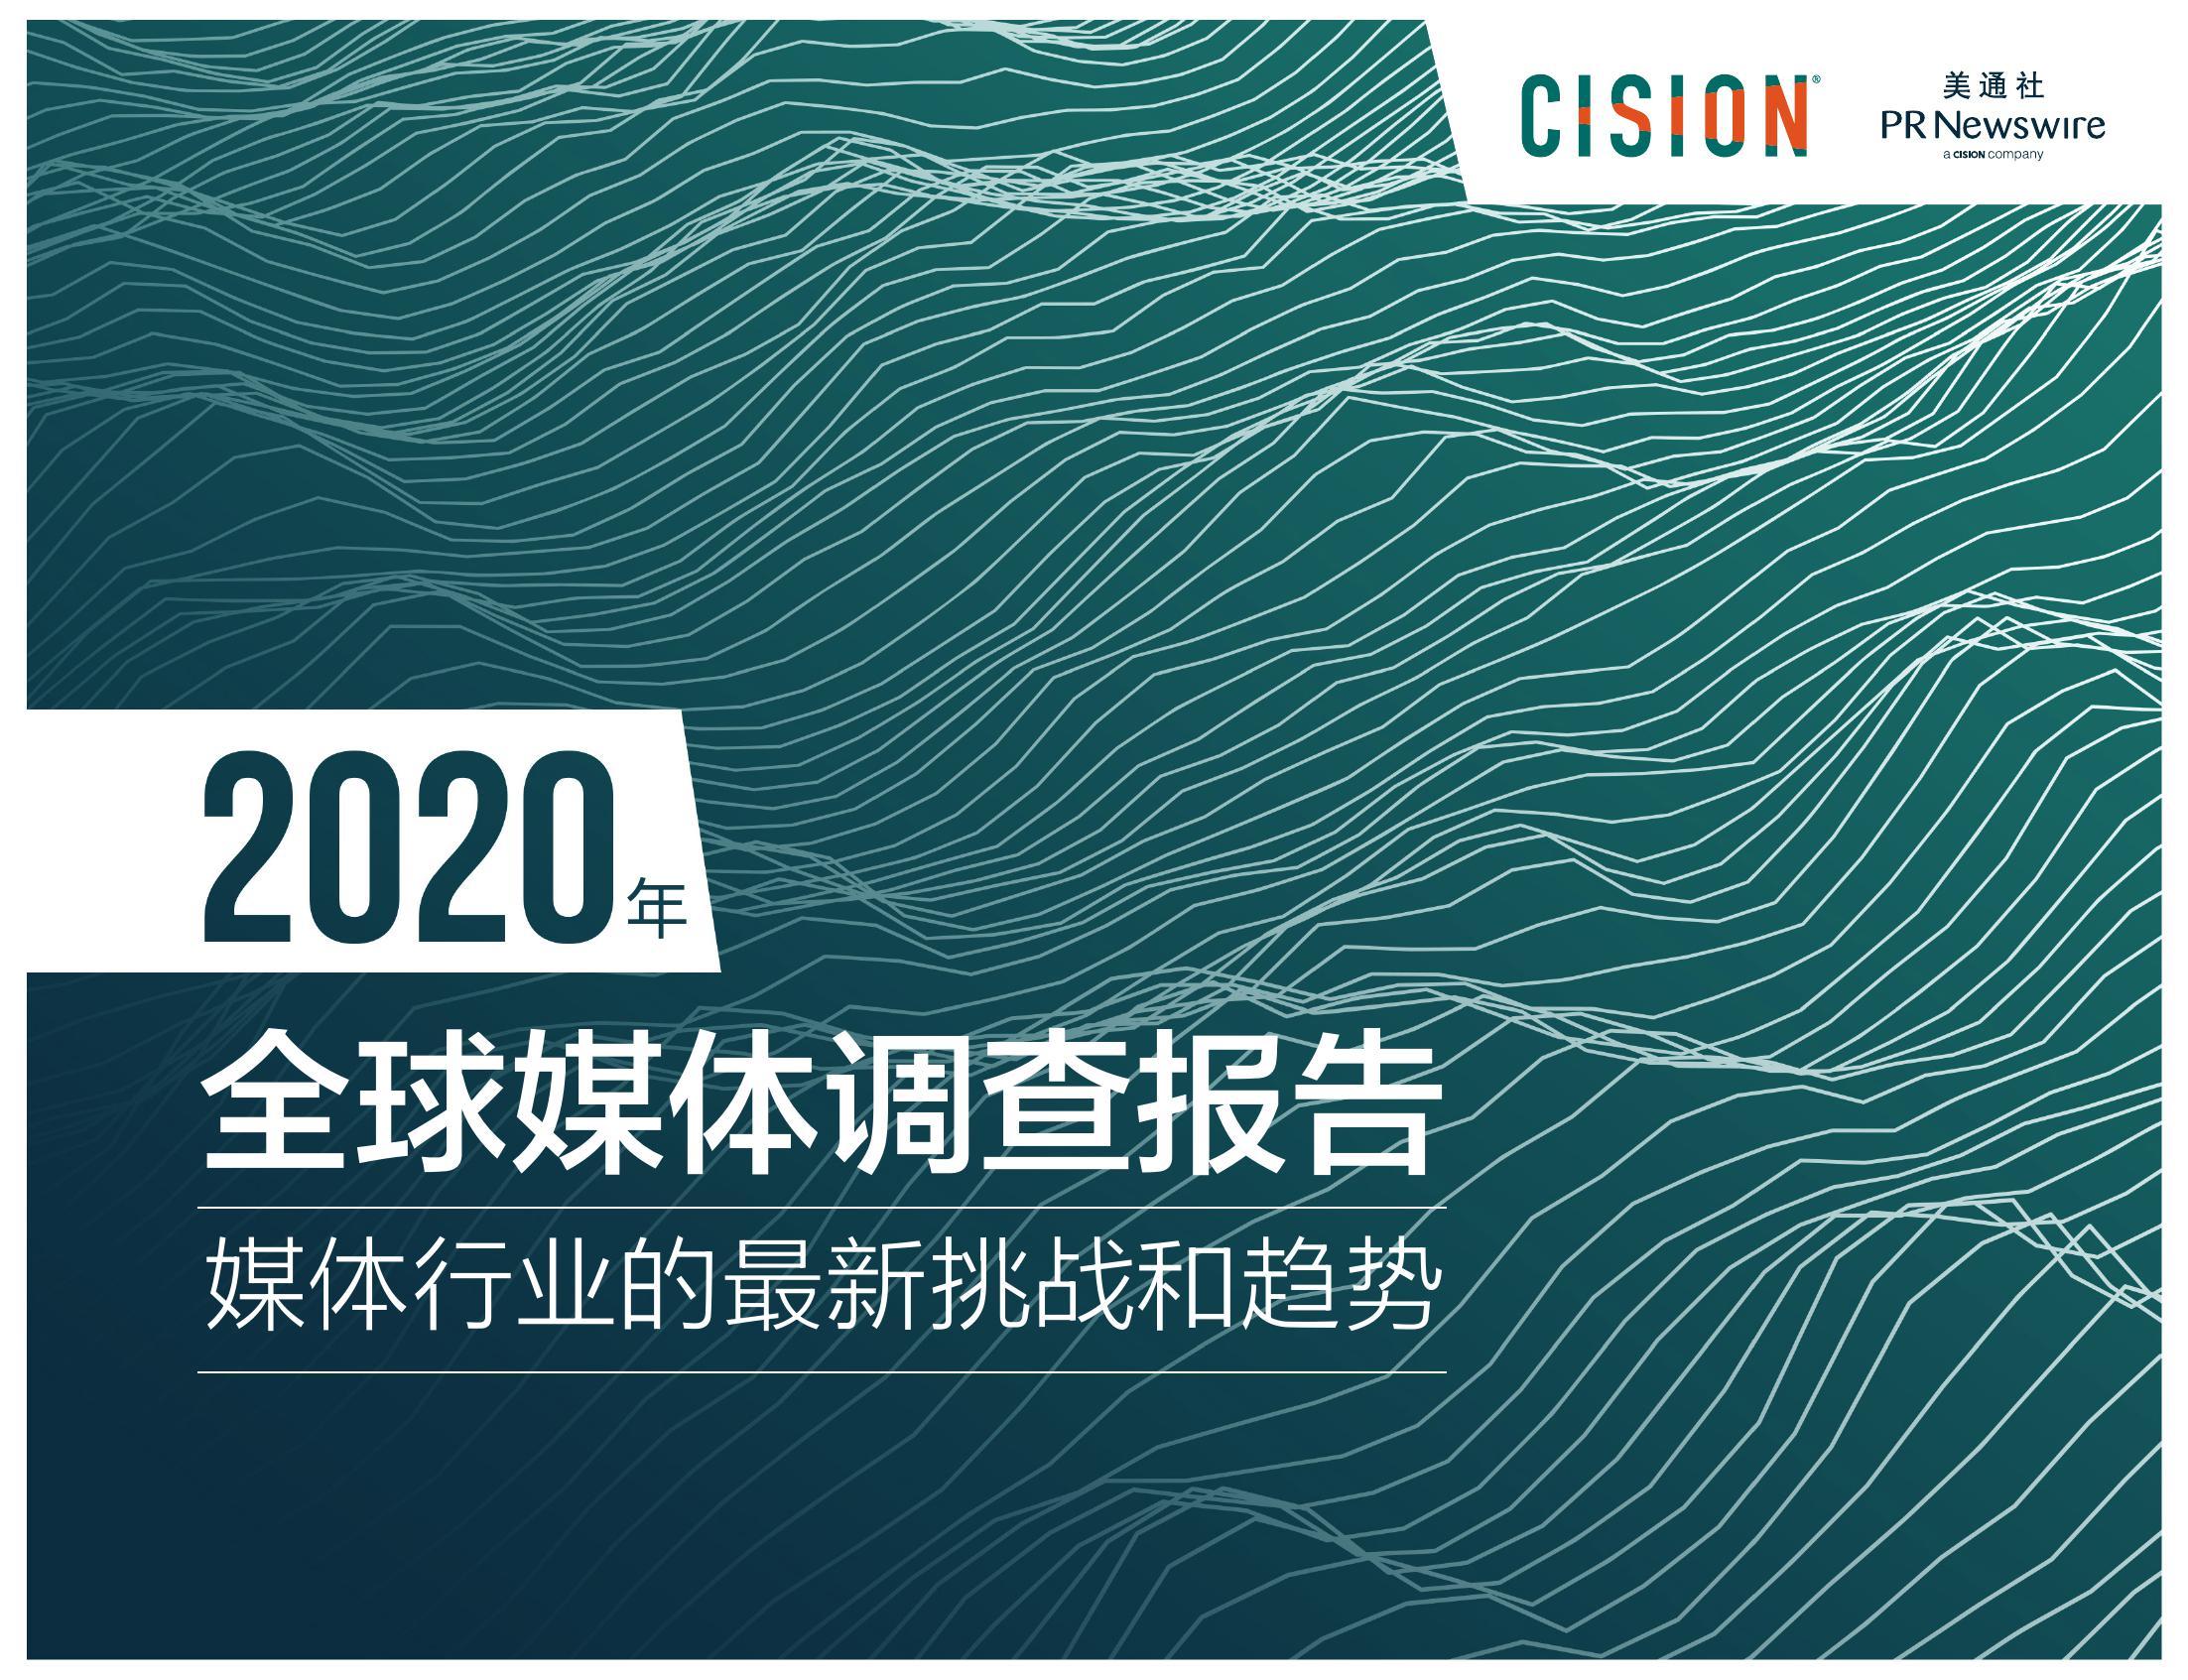 CISION:2020年全球媒体调查报告(附下载)